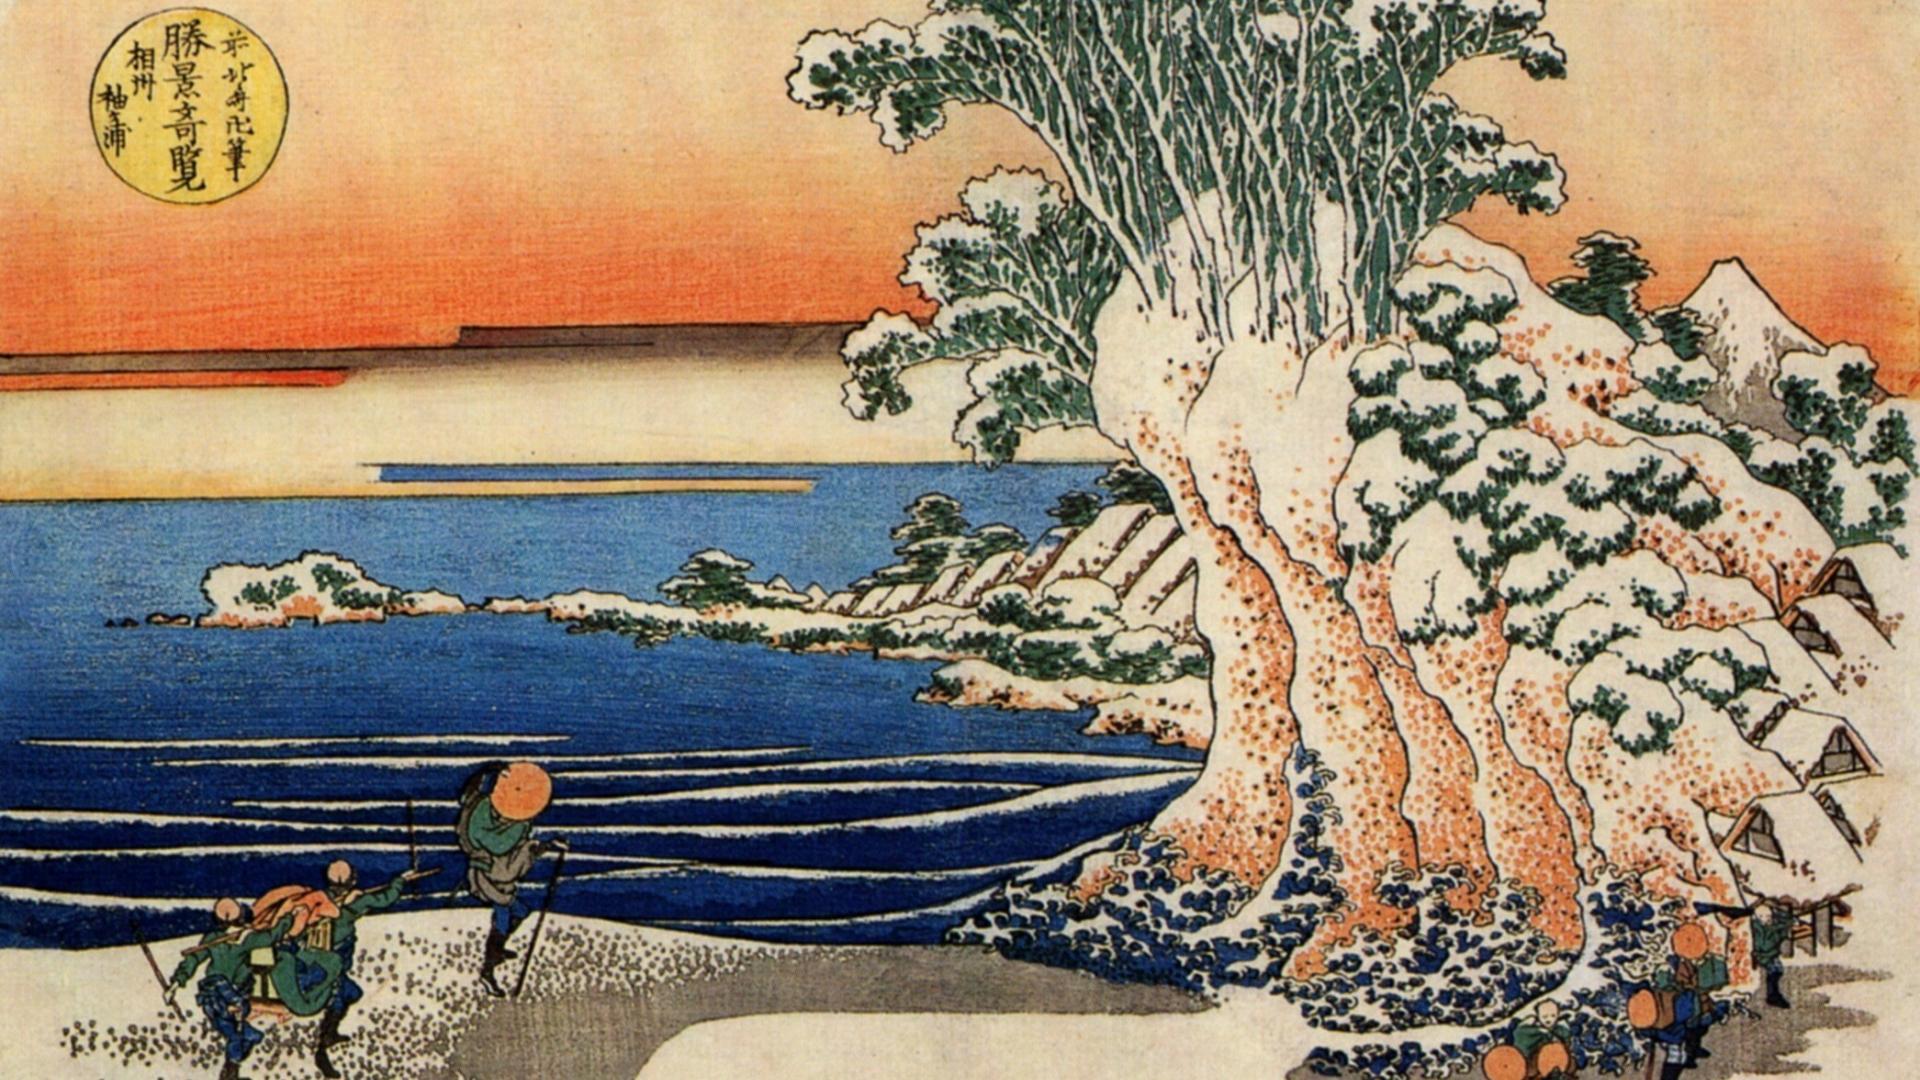 katshushika hokusai Hokusai definition, katsushika [kah-tsoo-shee-kah] /ˈkɑ tsʊˈʃi kɑ/ (show ipa), 1760–1849, japanese painter and illustrator see more.